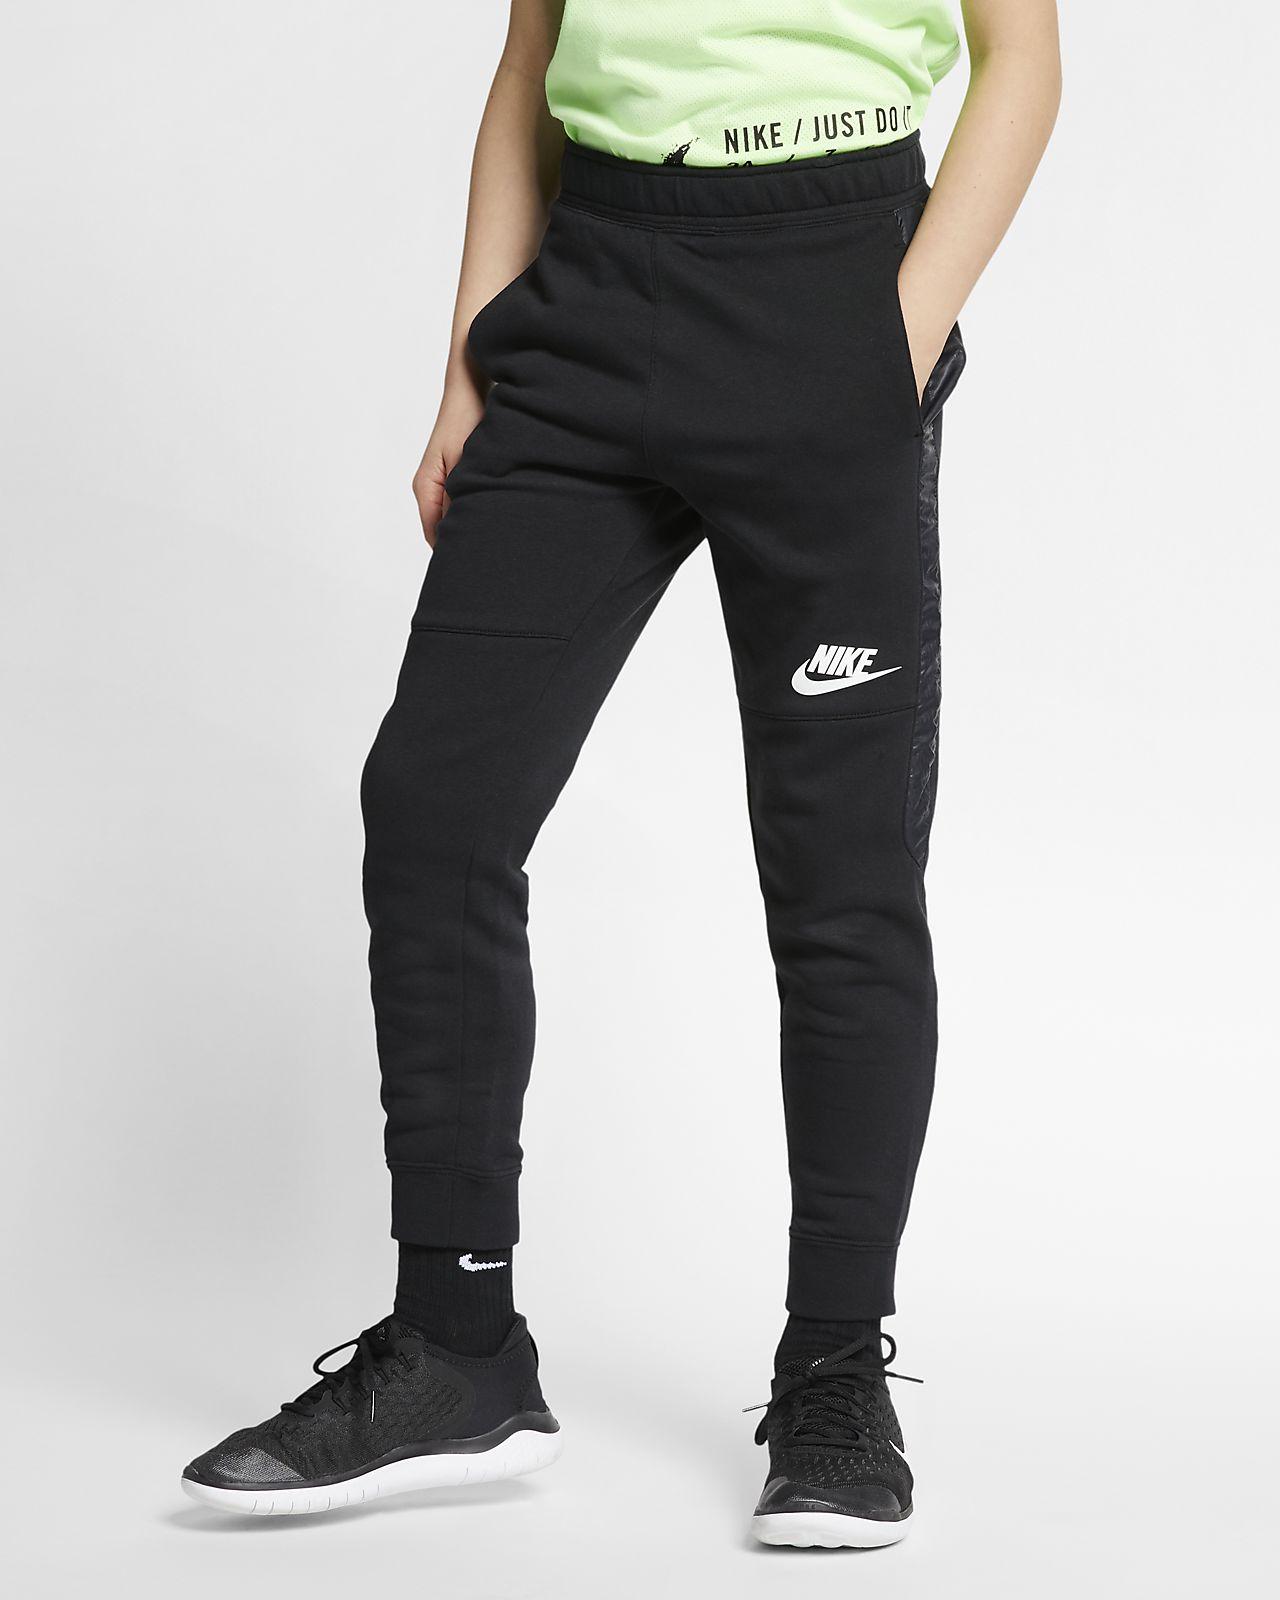 faa4c79200f71 Pantalon de jogging Nike Sportswear pour Enfant plus âgé. Nike.com FR